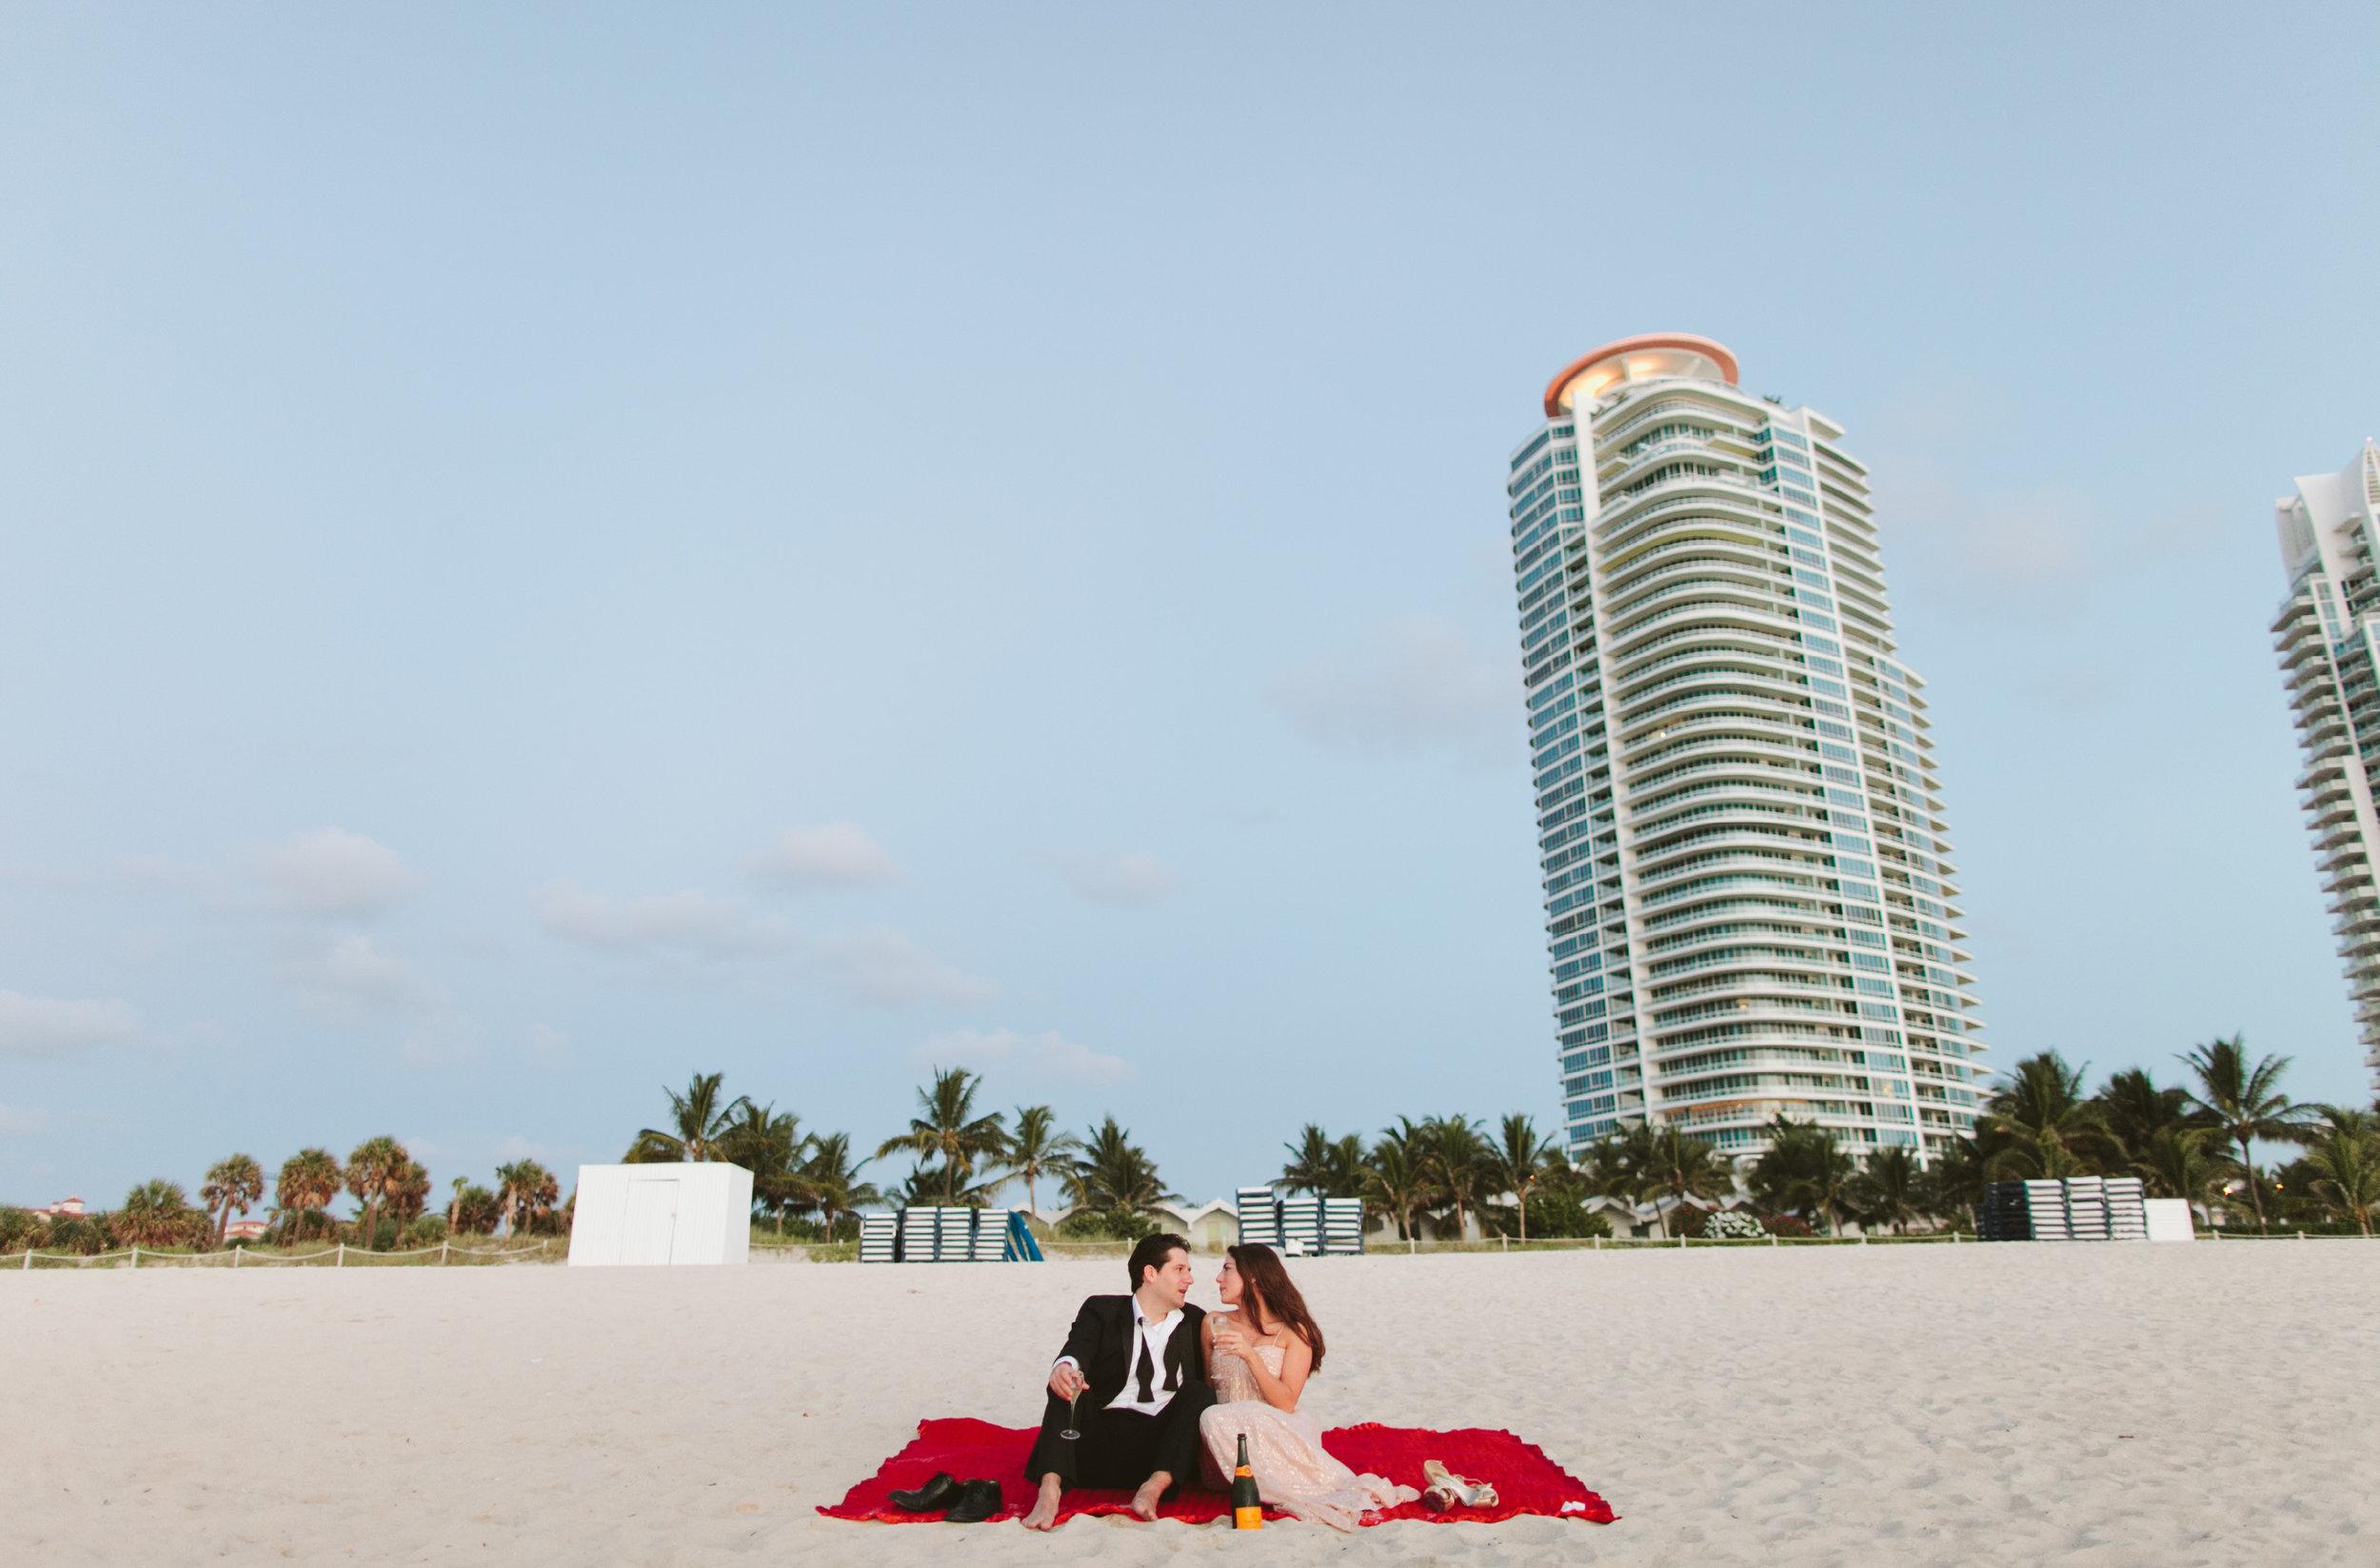 Meli + Mike South Pointe Park South Beach Miami Engagement Shoot12.jpg